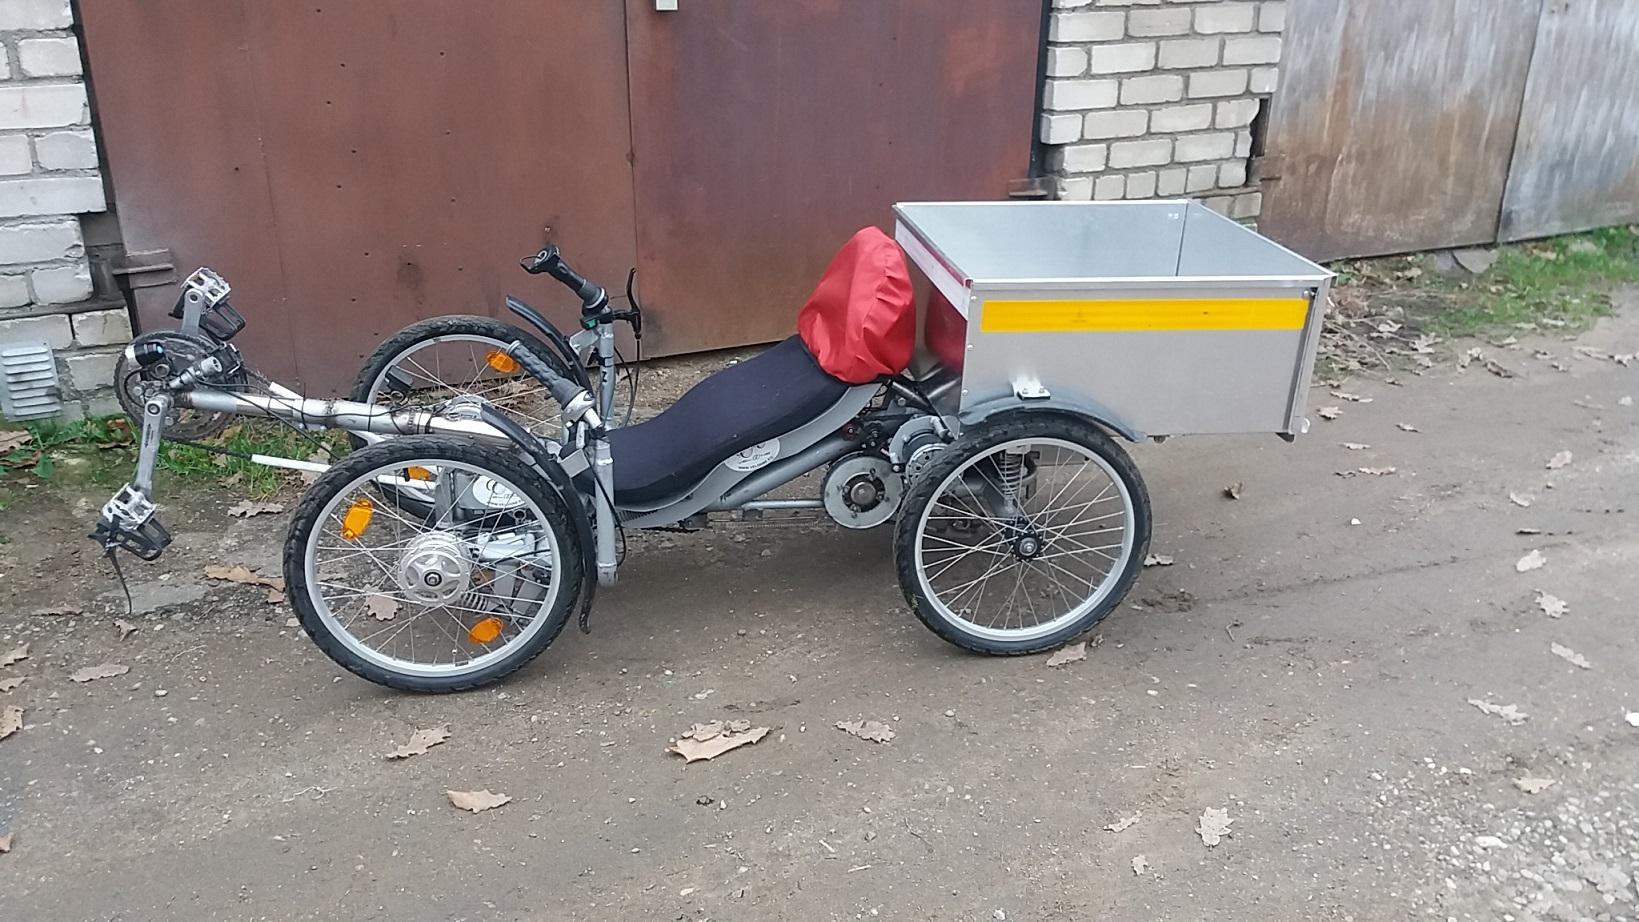 Velomobile Veloone prototype with cargo box side view.